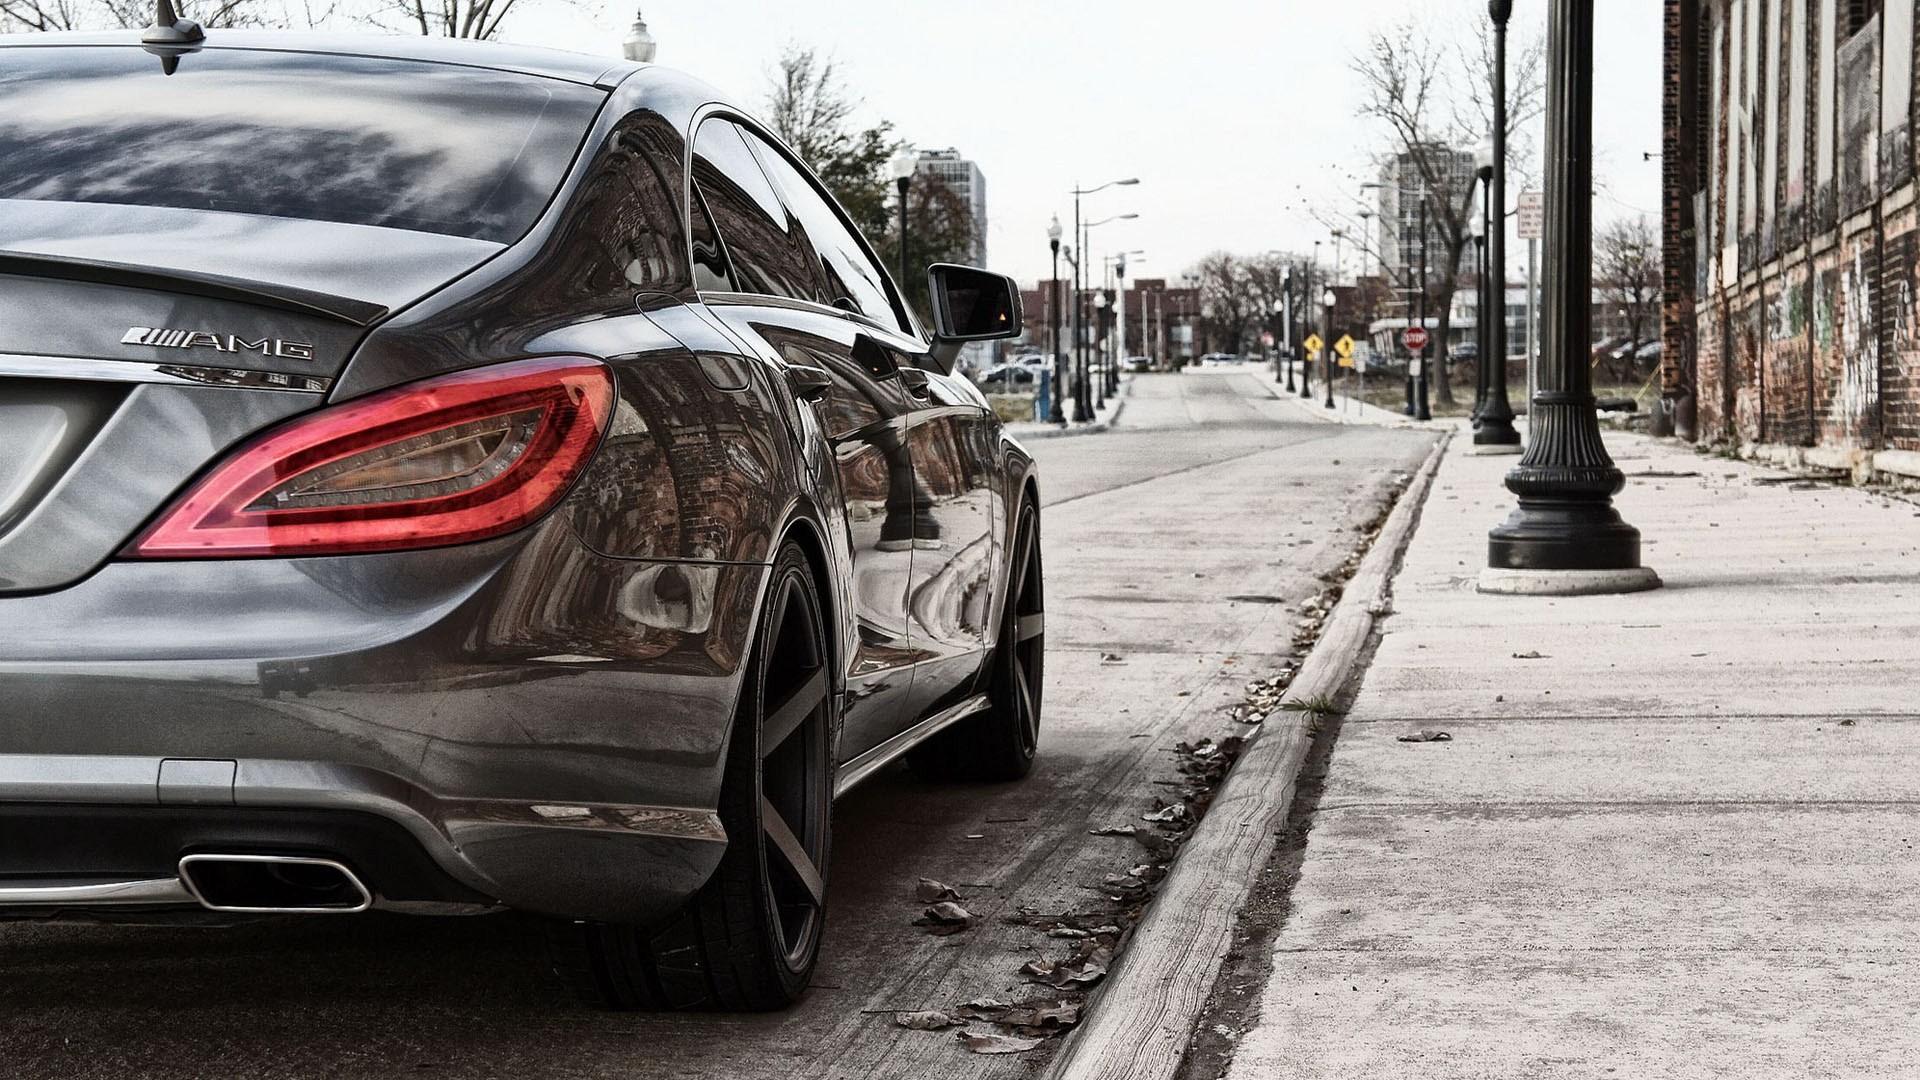 Mercedes Mlg Near Sidewalk. mercedes benz logo